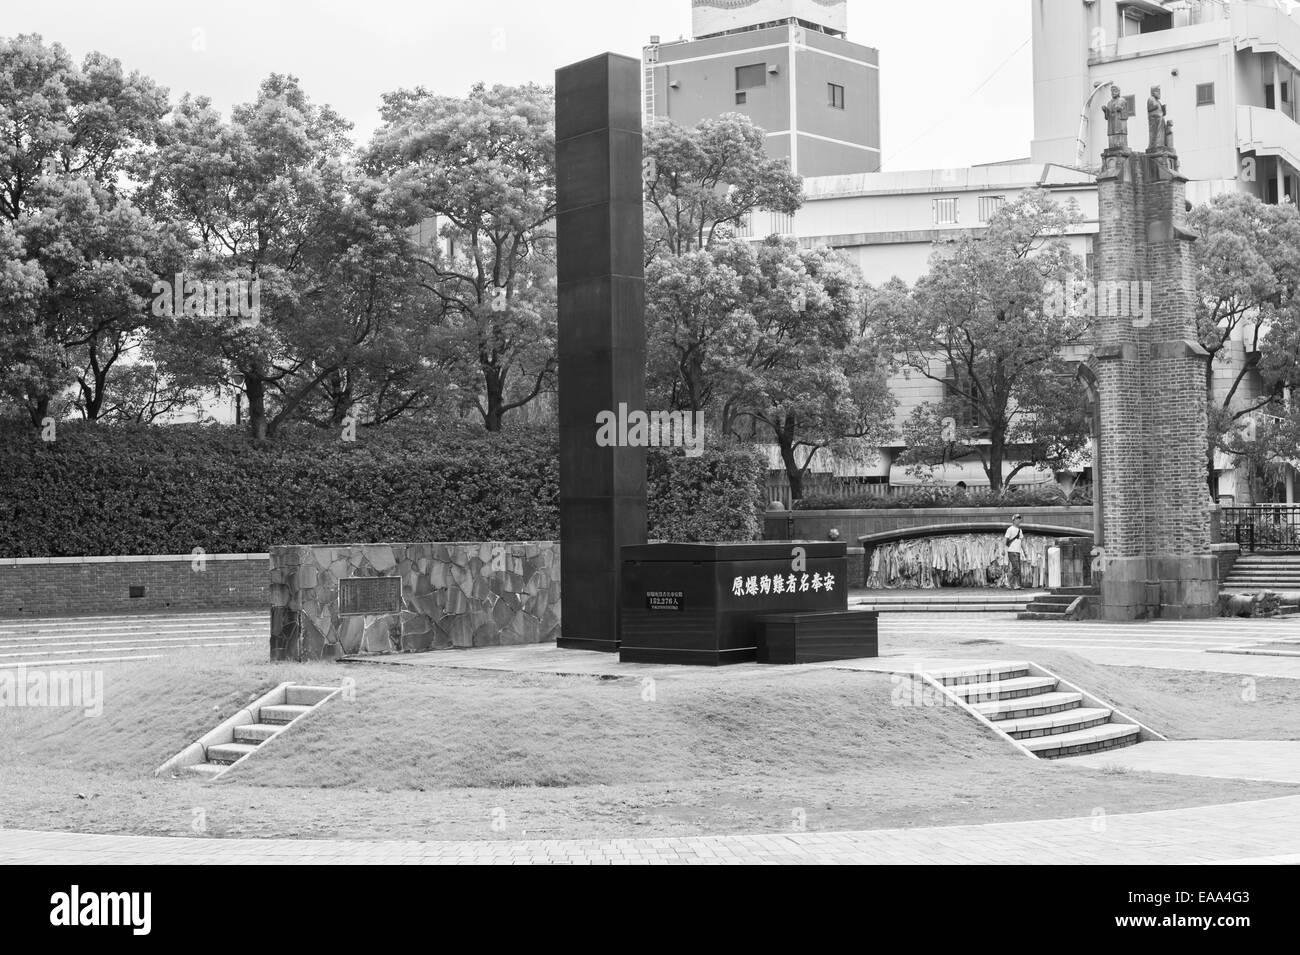 Ground zero memorial at epicenter of atomic explosion,Nagasaki prefecture,Kyushu,Japan - Stock Image